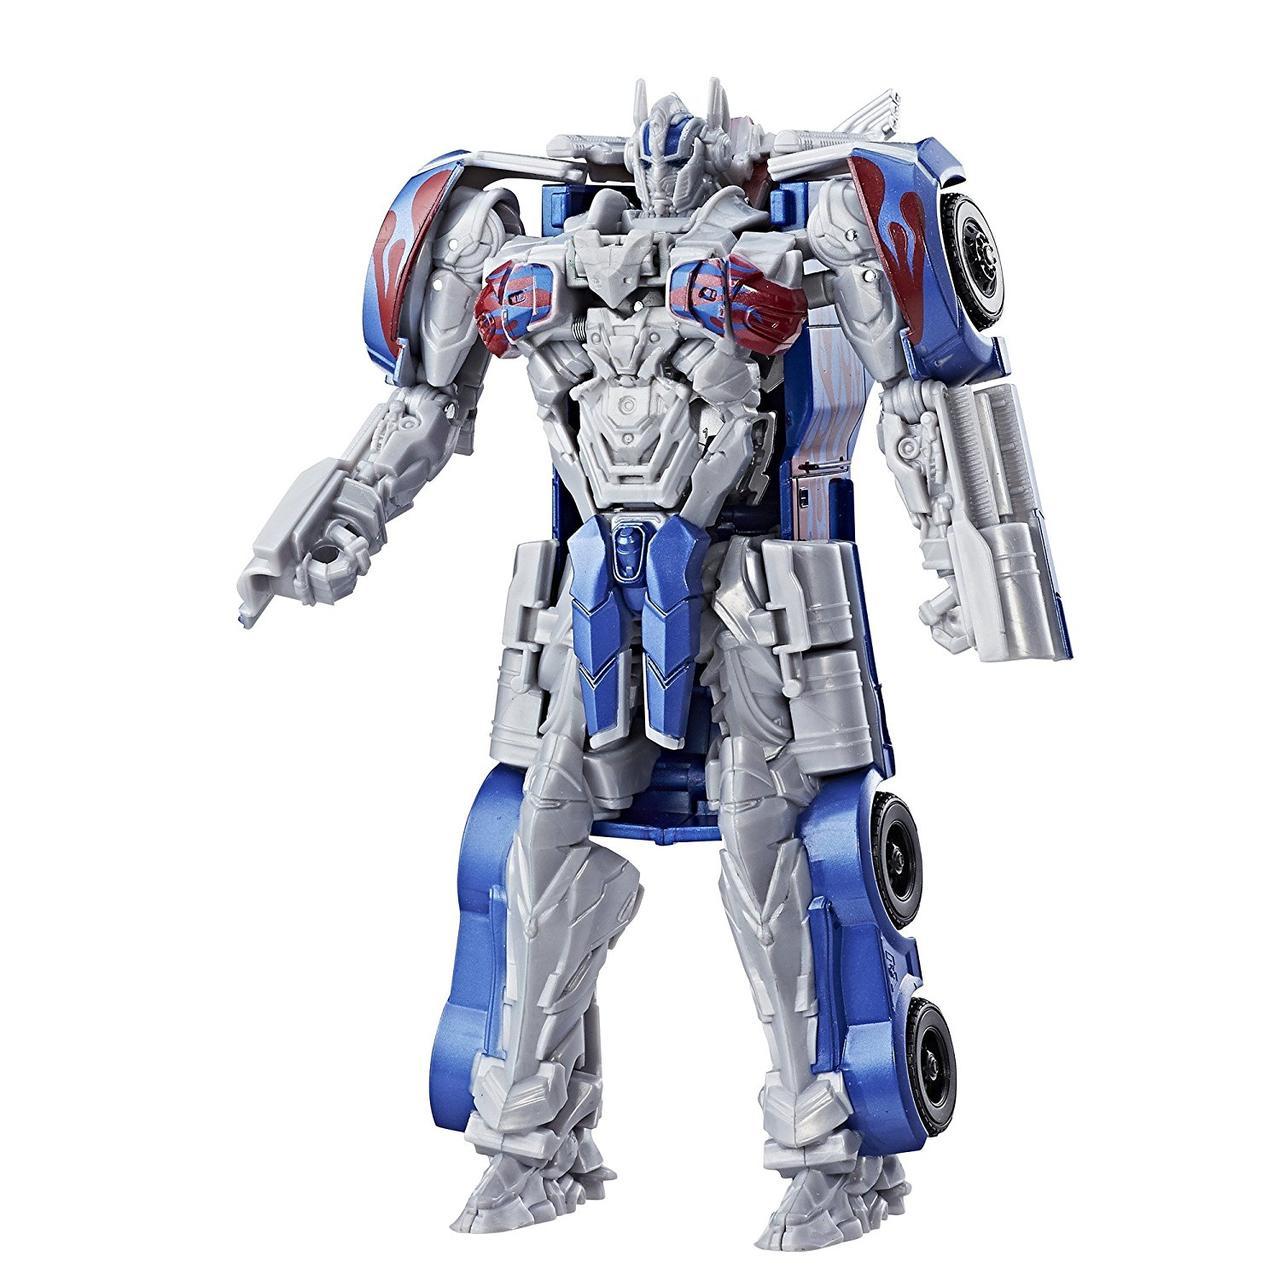 Transformers Трансформеры Последний рыцарь Оптимус Прайм The Last Knight-Knight Armour Turbo Changer Optimus Prime